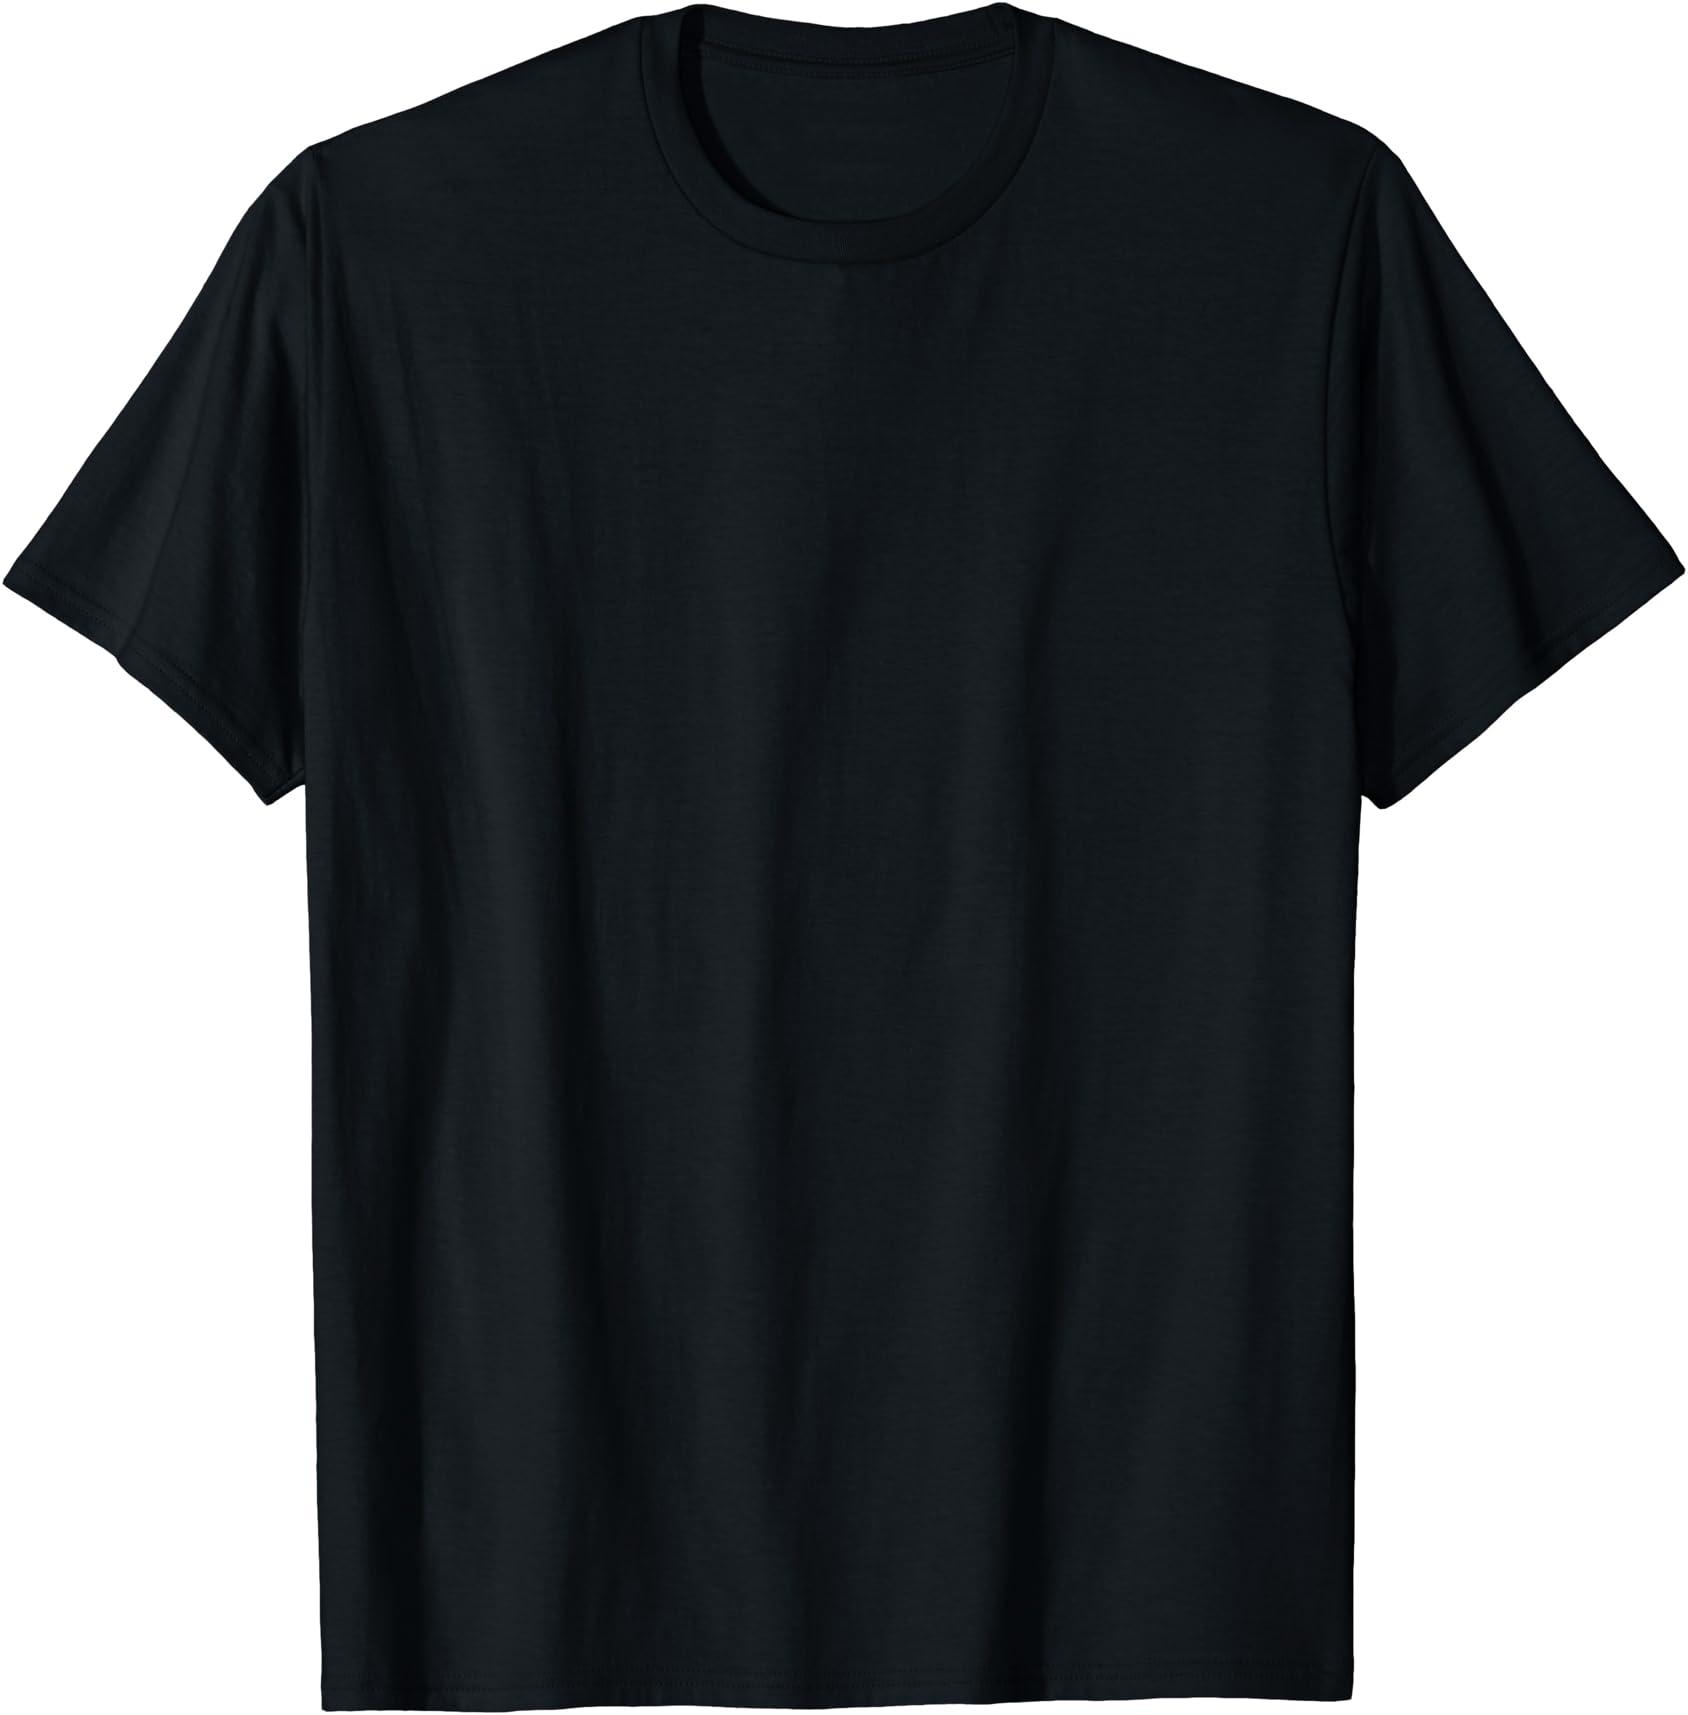 Baby Fox Kid/'s T-Shirt Children Boys Girls Unisex Top